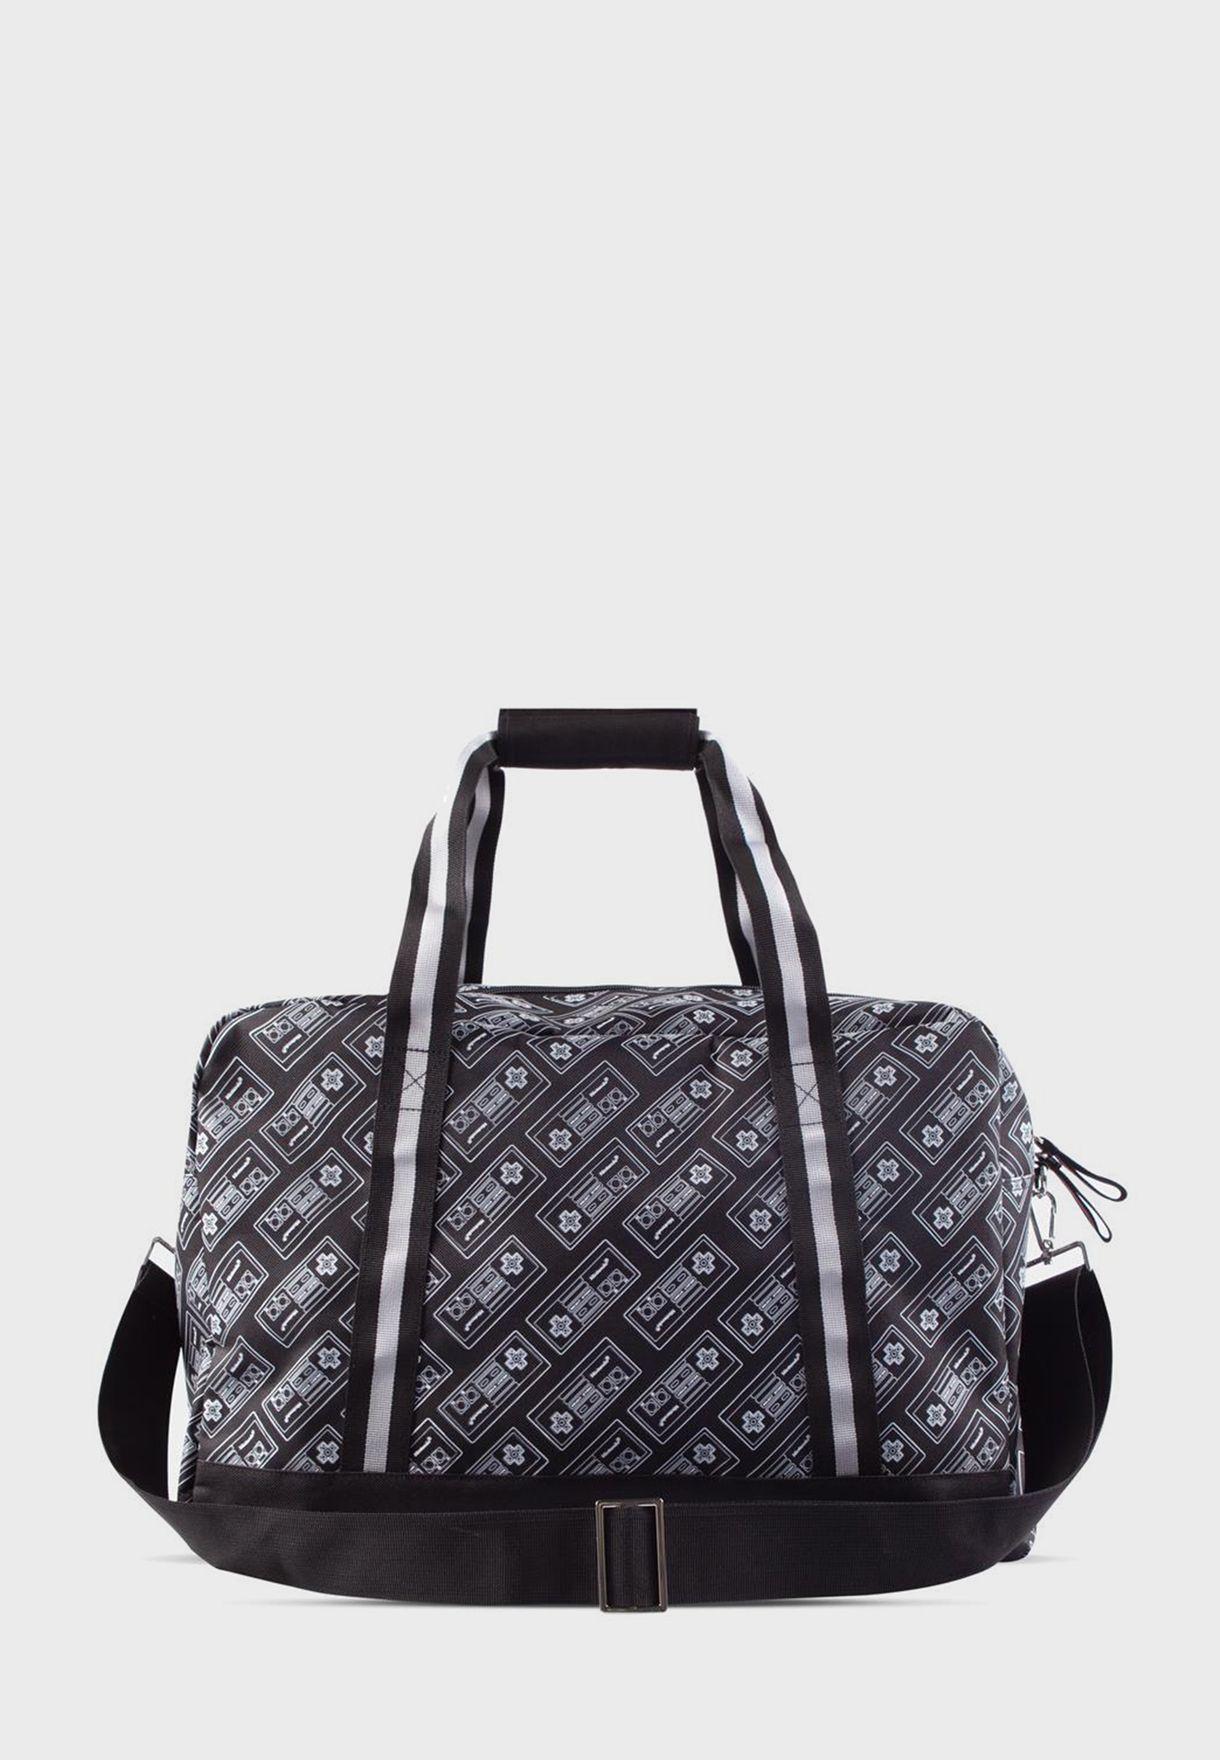 Duffel Bag With Top Handle